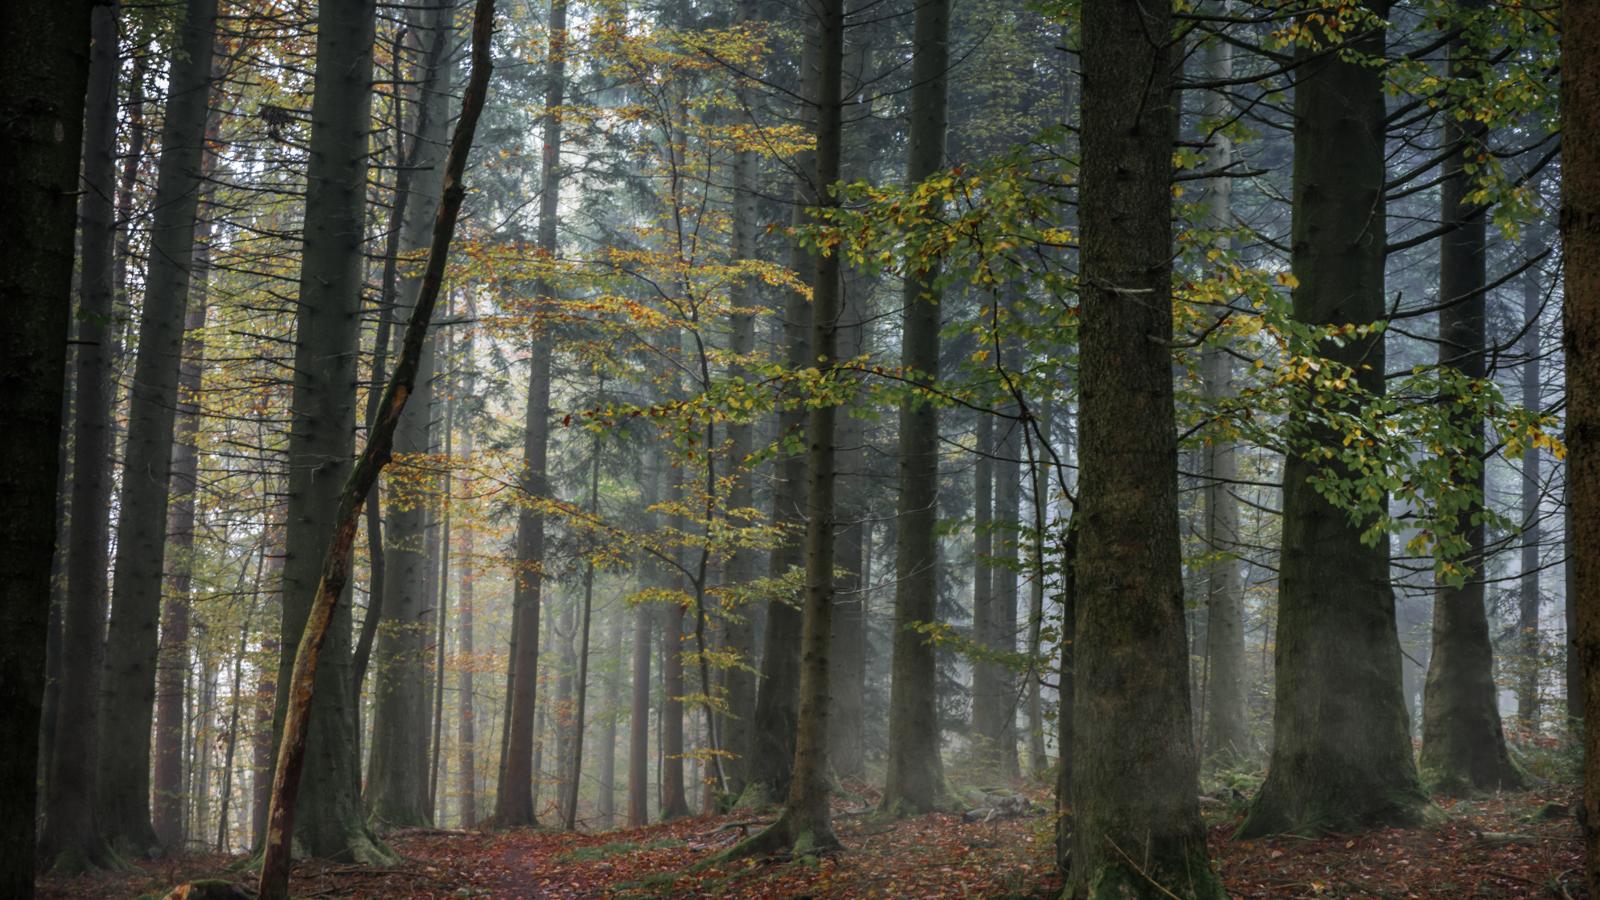 Zsofia_Daniel_Trees-7.jpg